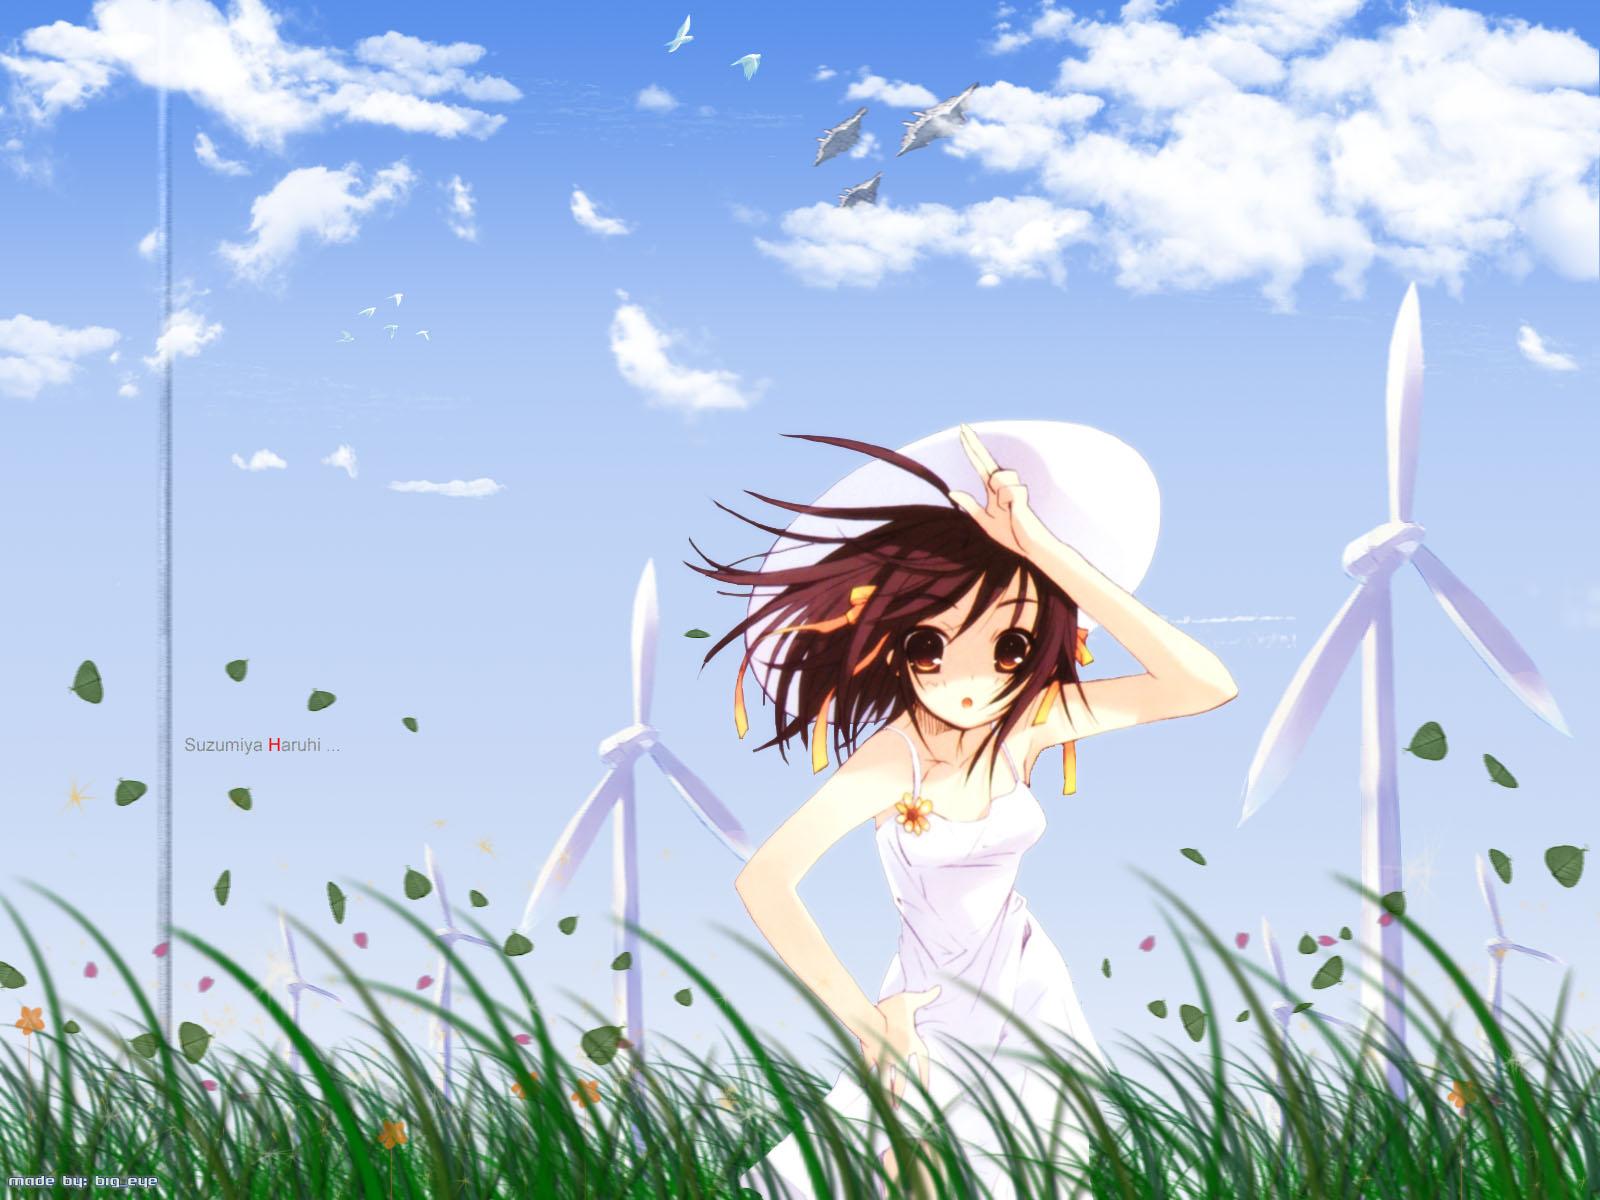 itou_noiji suzumiya_haruhi suzumiya_haruhi_no_yuutsu windmill